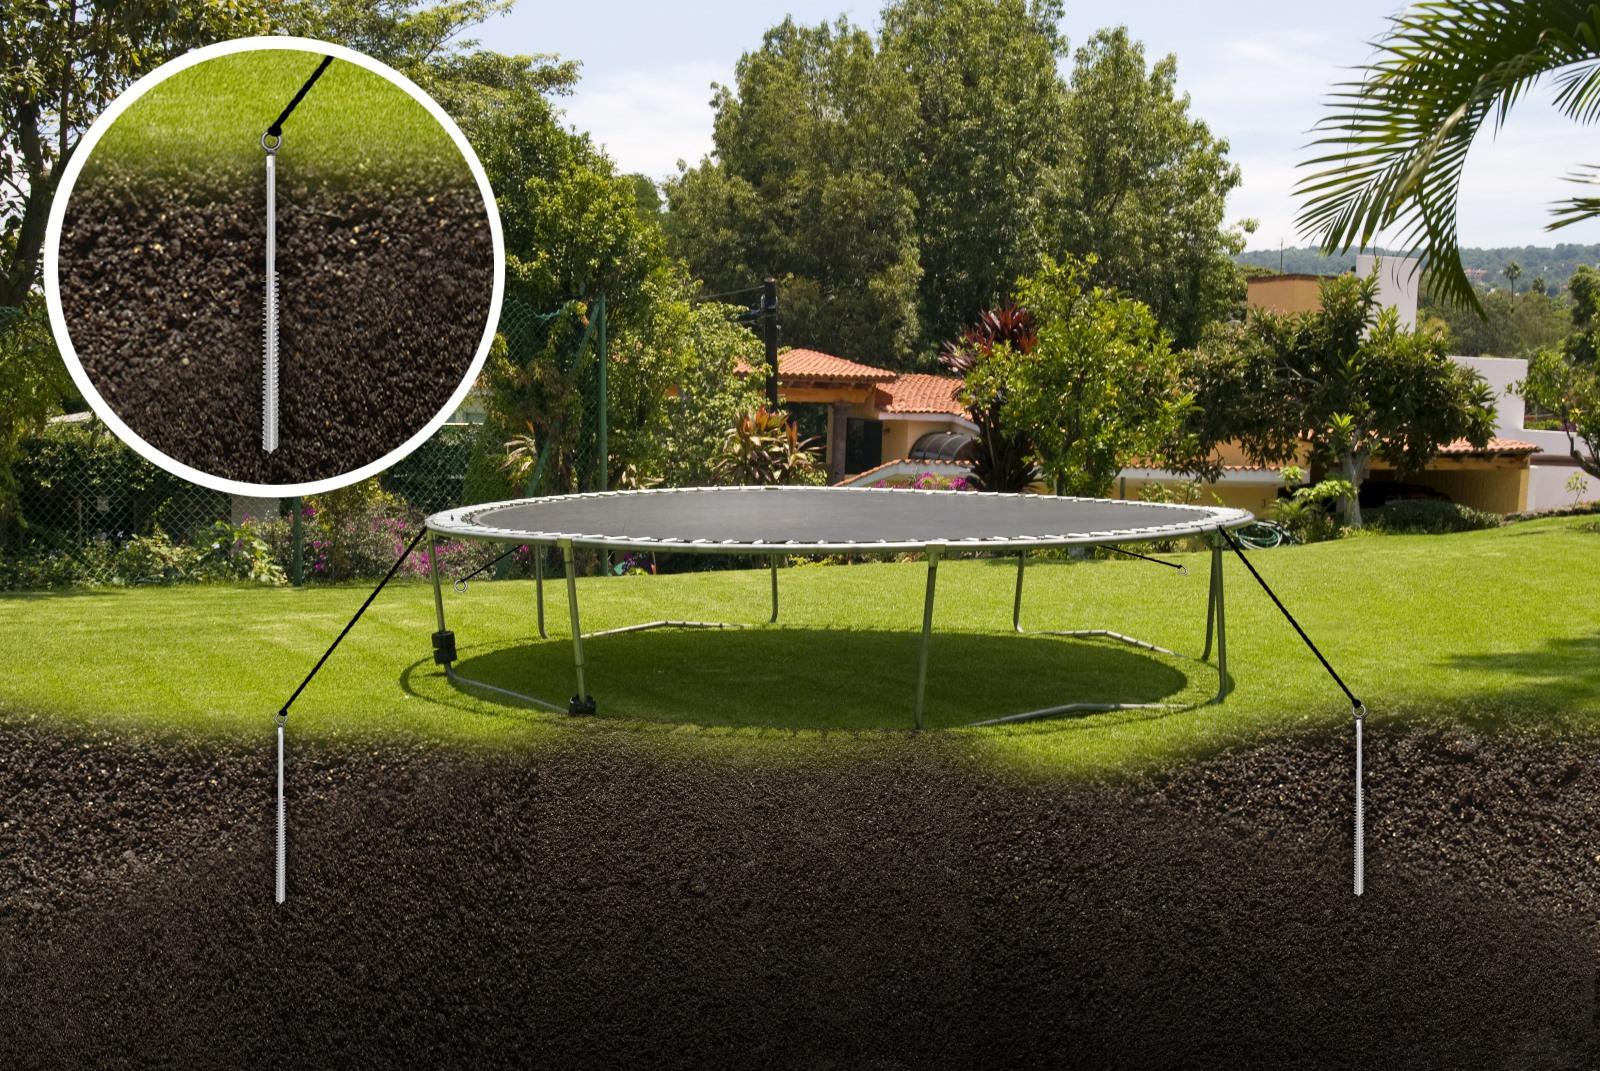 trampoline-anchors-1.jpg